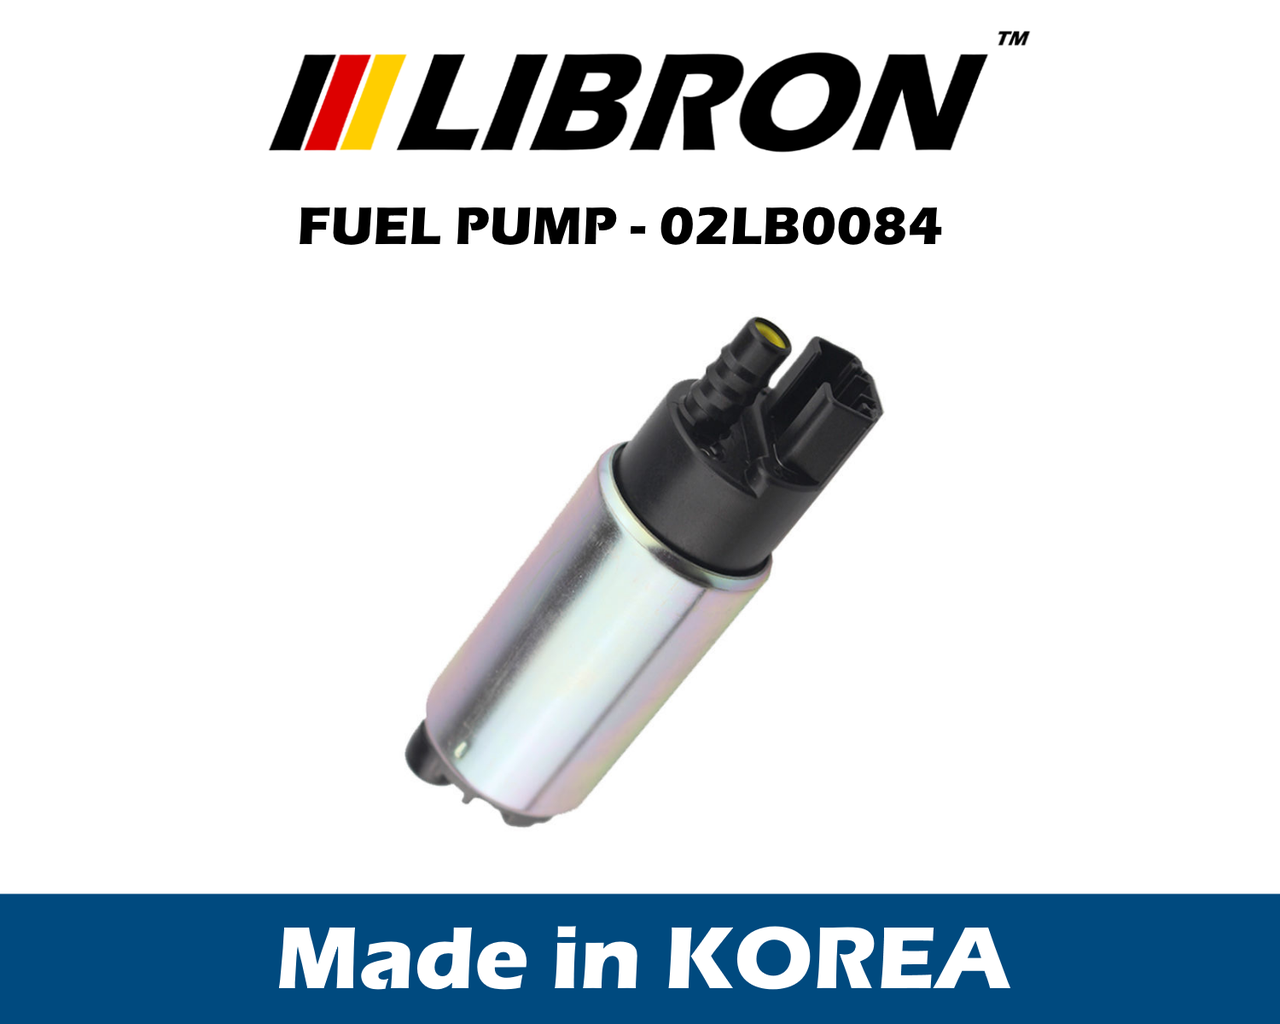 Топливный насос LIBRON 02LB0084 - SUBARU JUSTY I